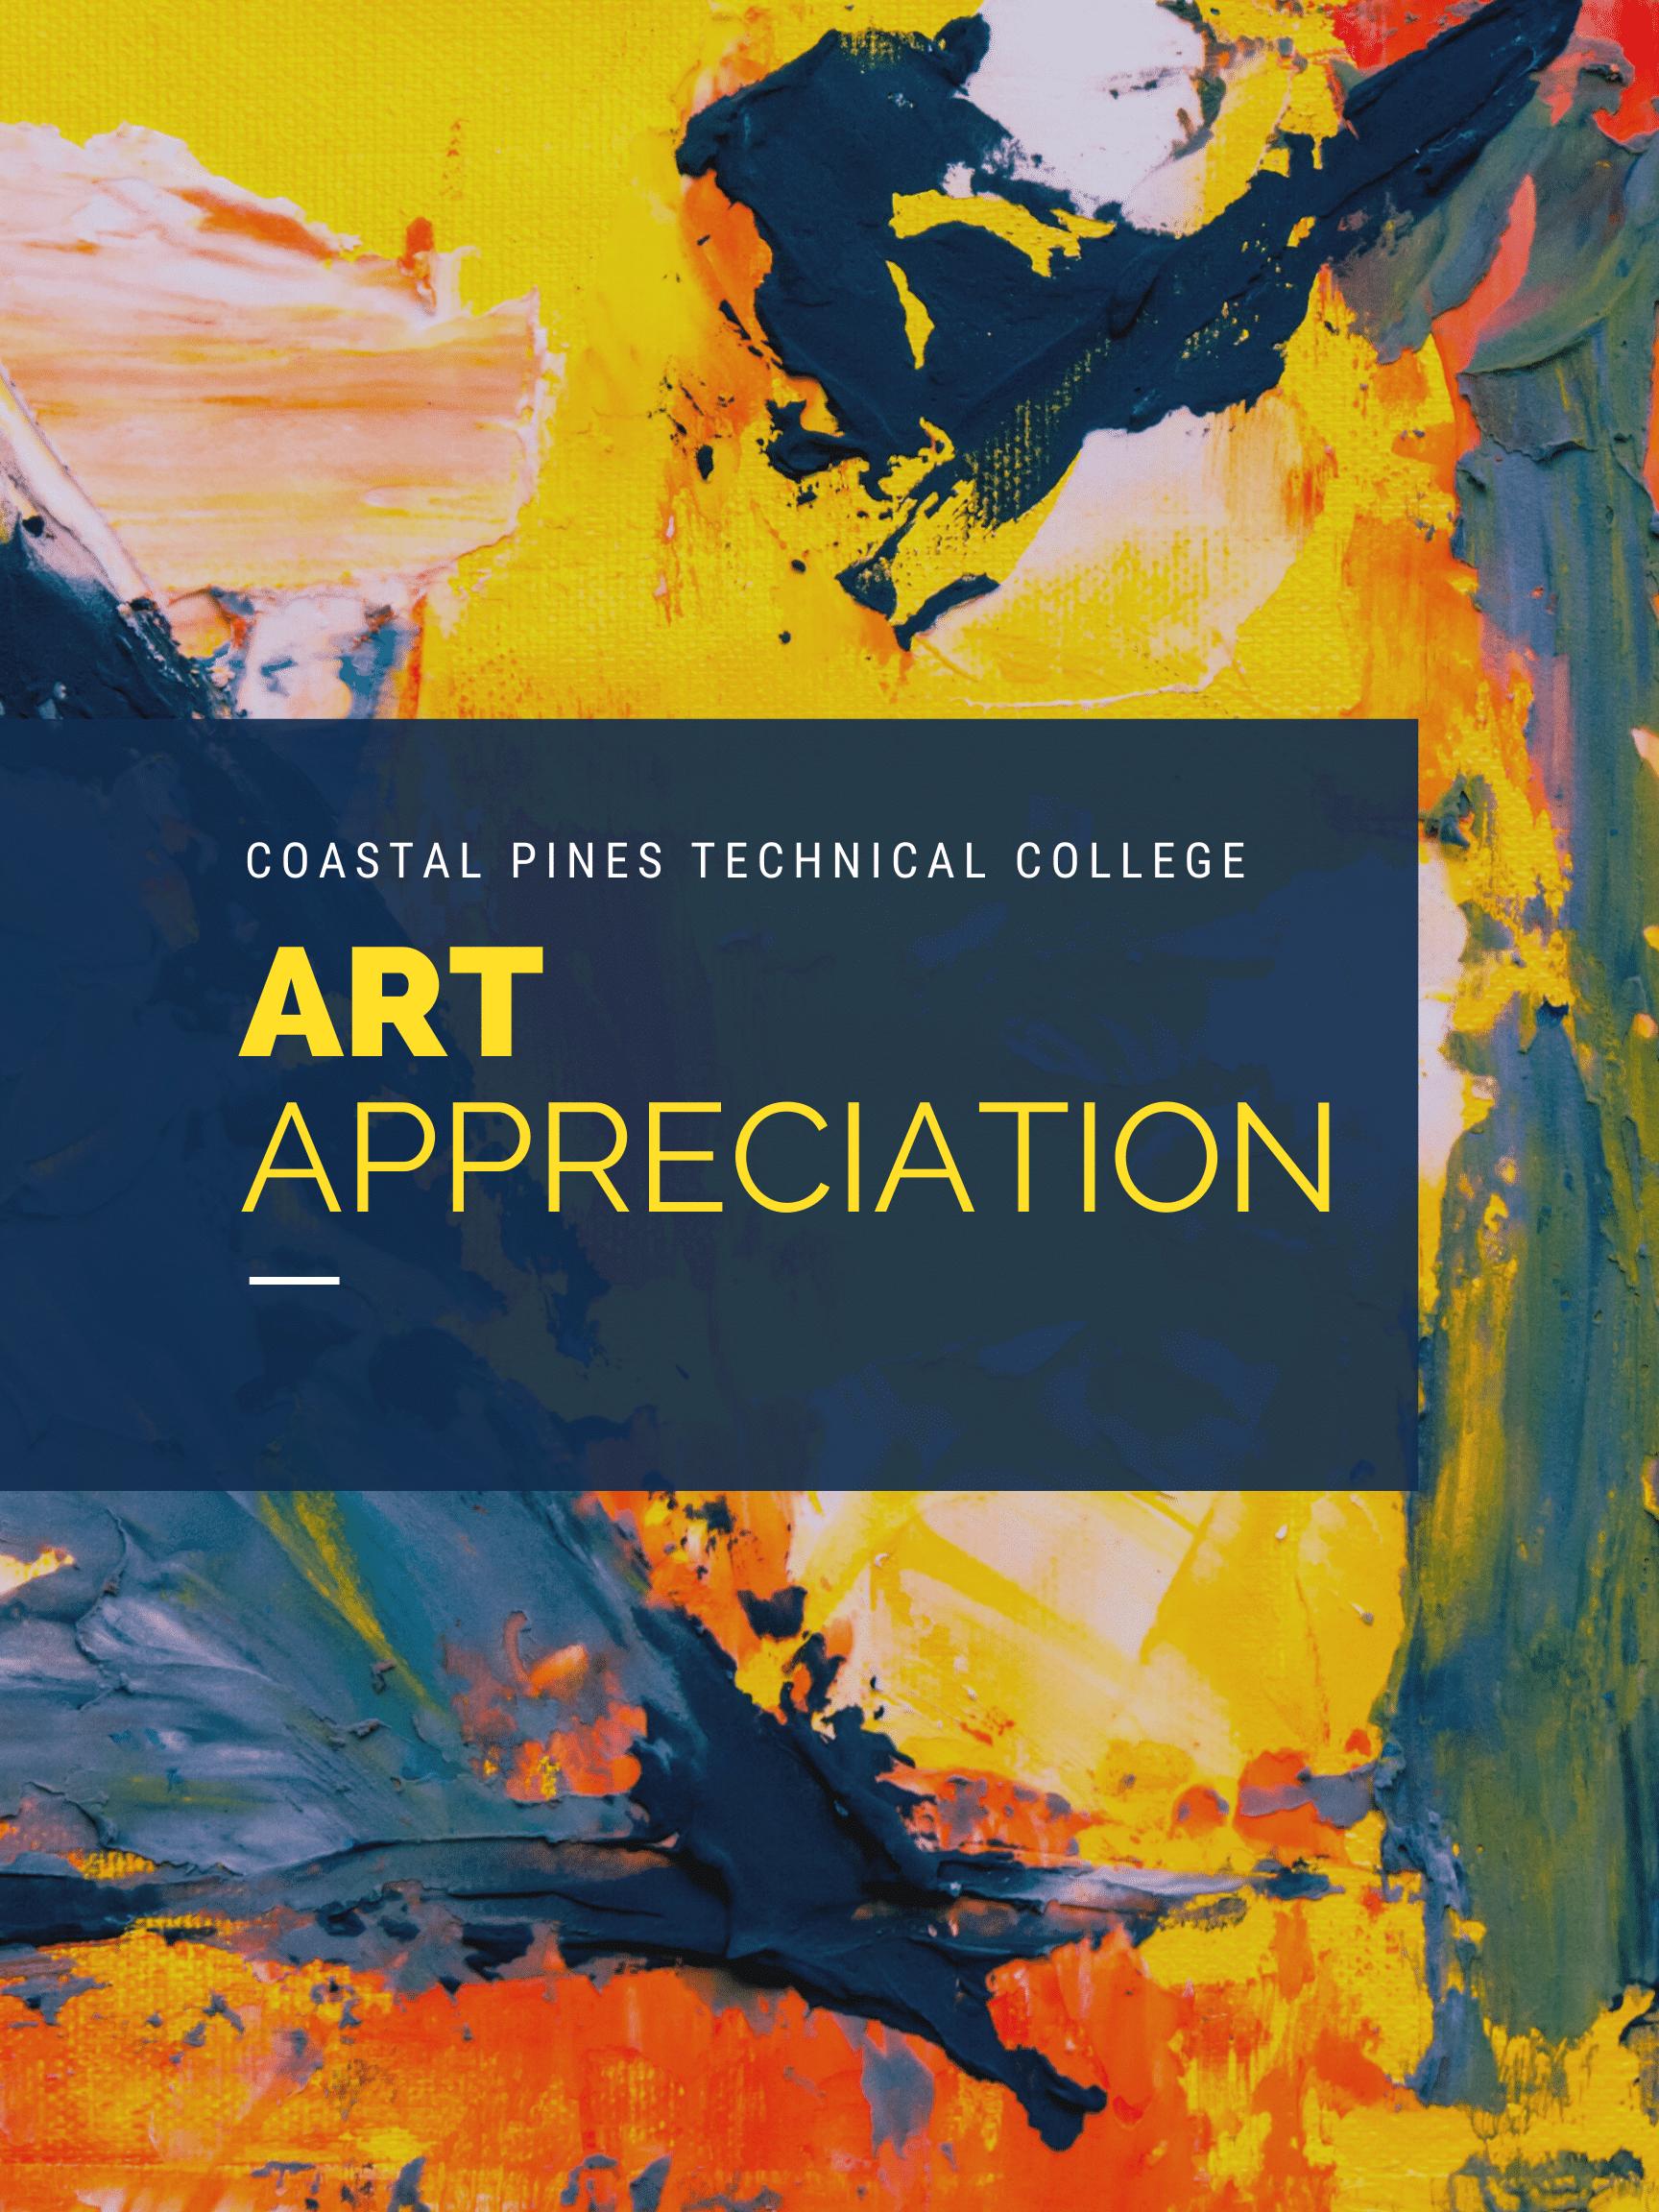 Coastal Pines Technical College Art Appreciation